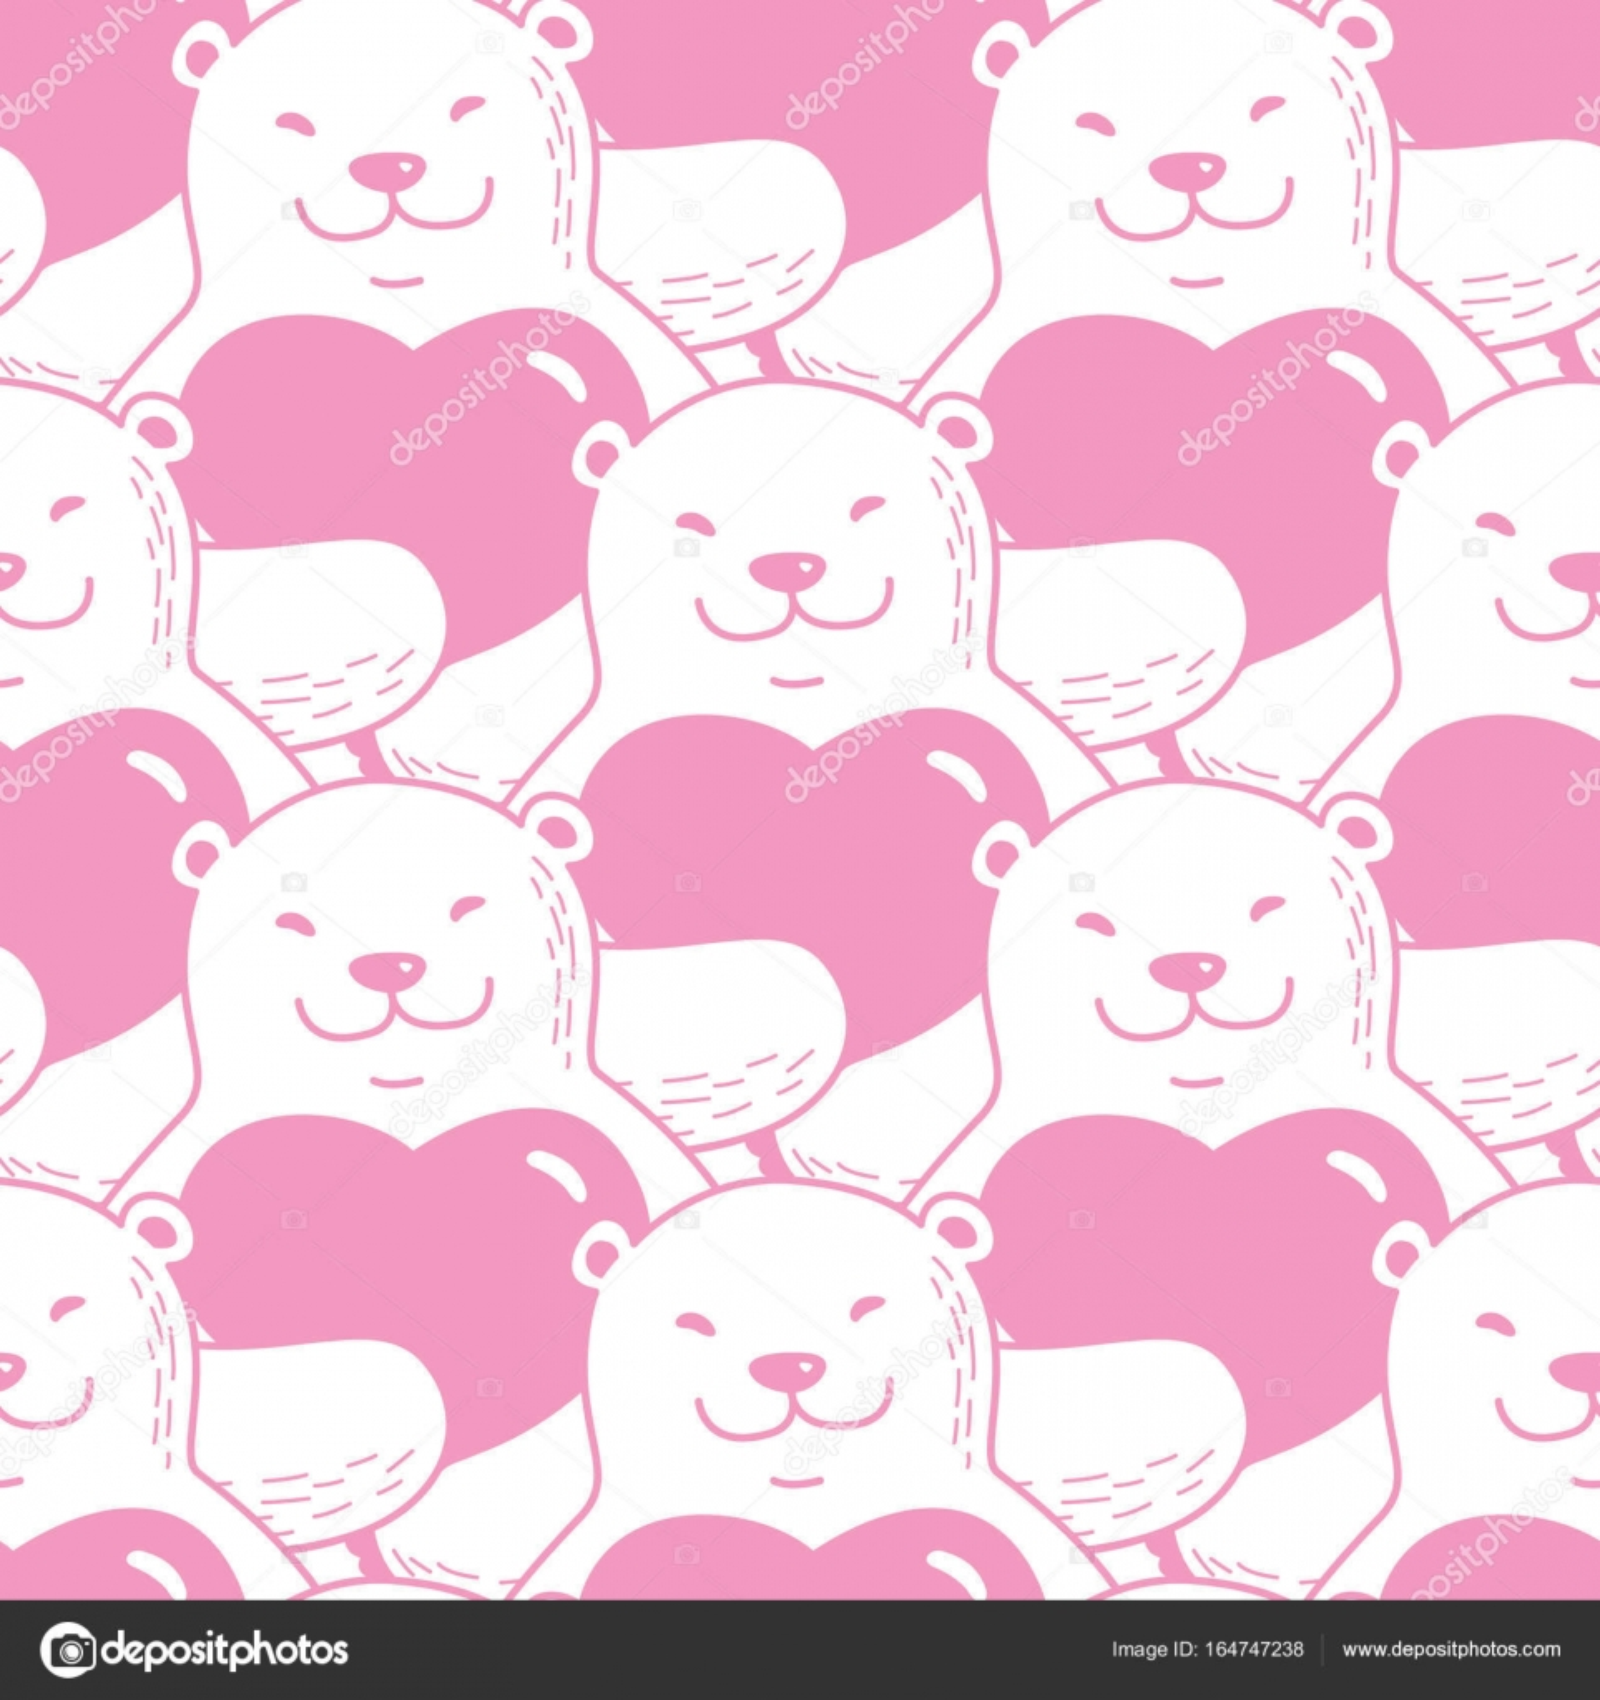 Bear Hug Heart Valentine Doodle Seamless Pattern Wallpaper